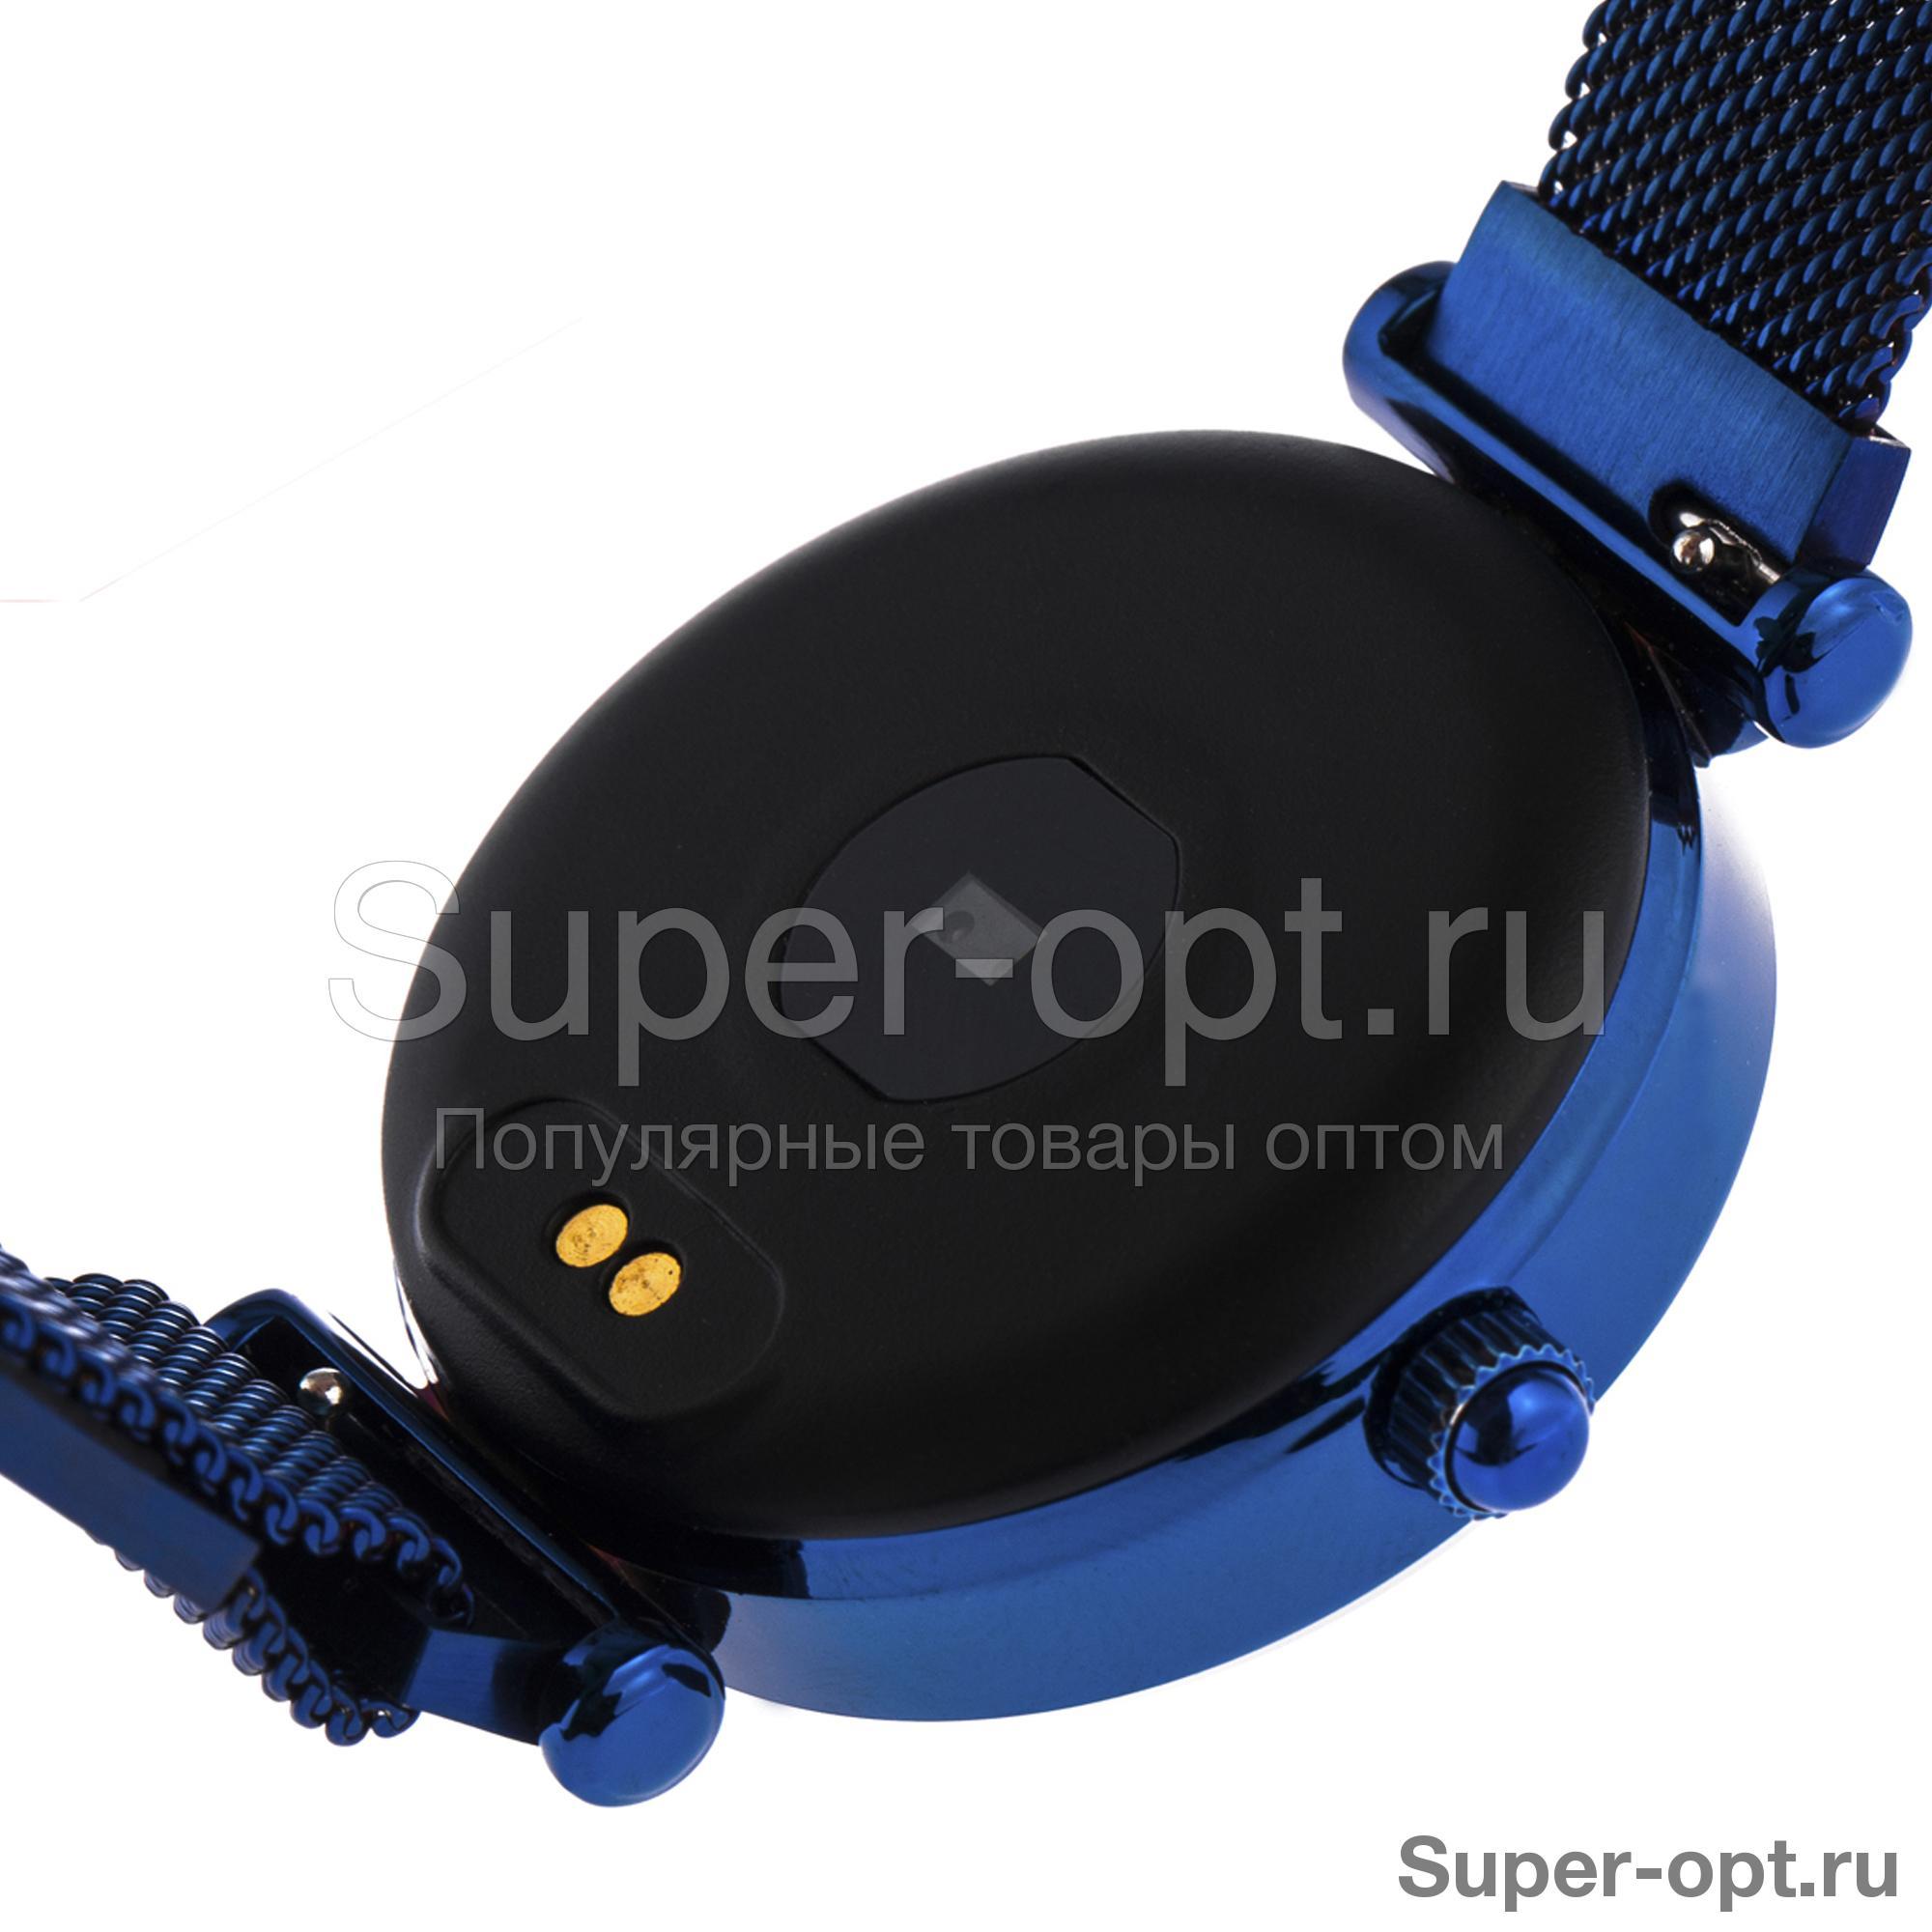 Умные часы Smart Watch Starry Sky H1 оптом